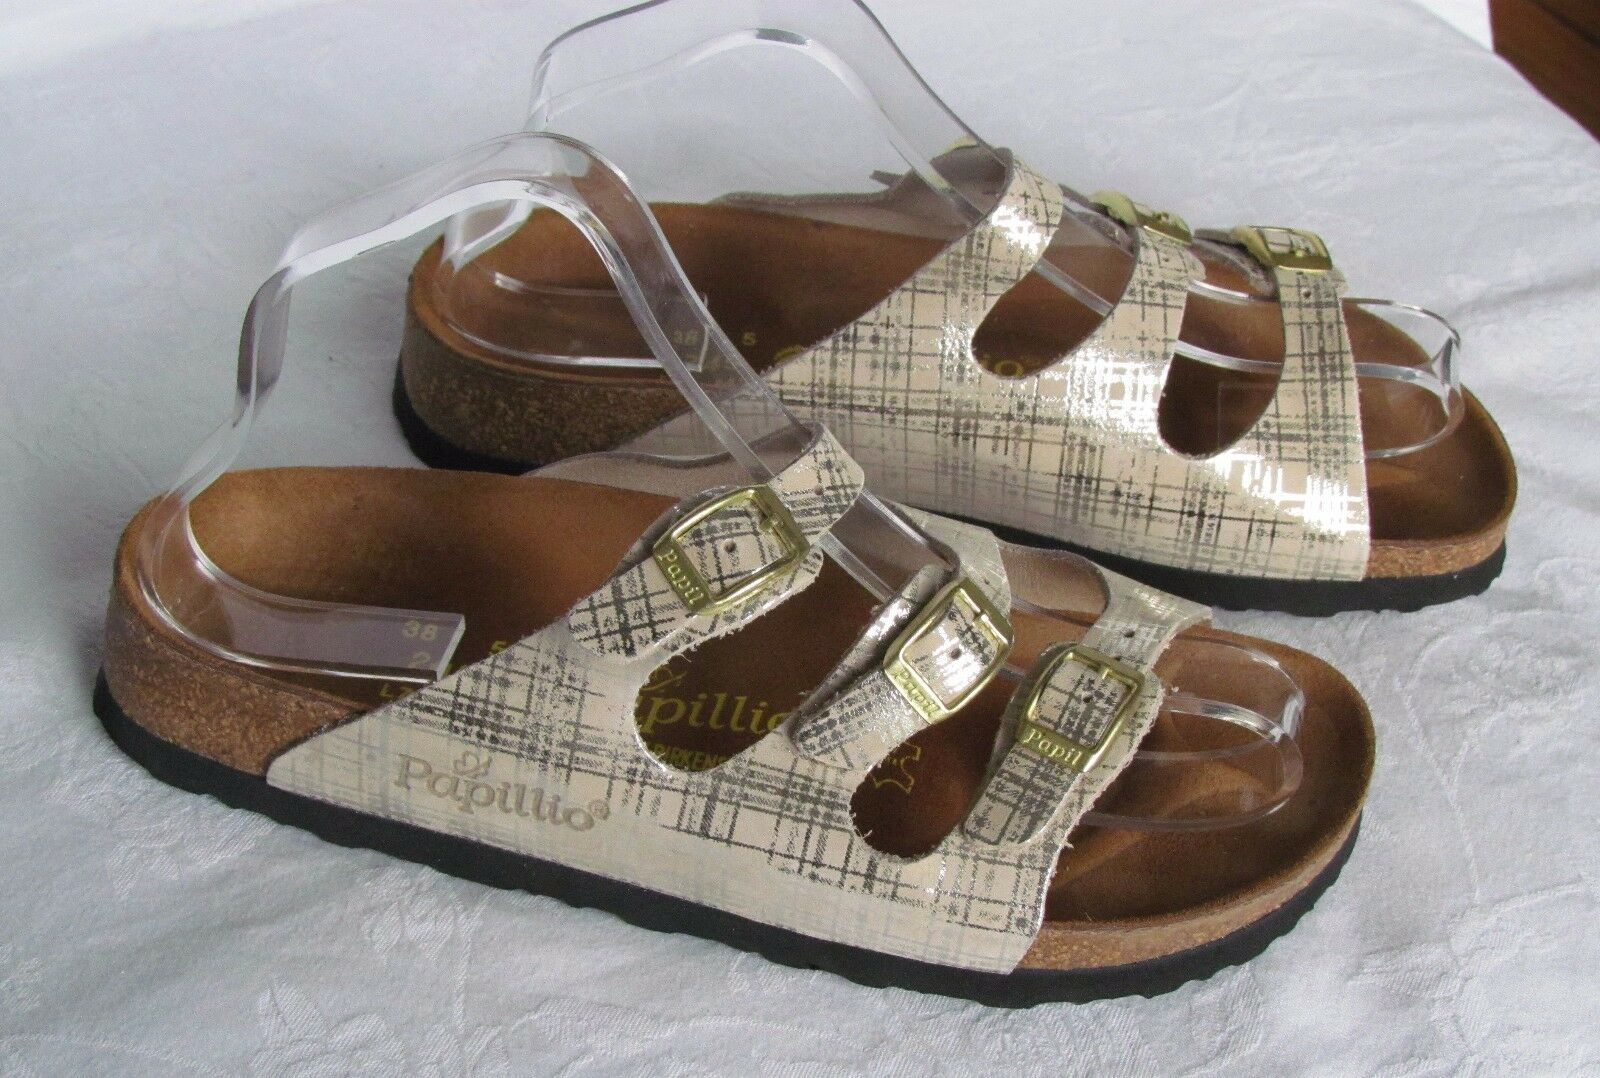 Último gran descuento NEW Papillio By Birkenstock Ladies Florida Gold Cream Patent Sandals Size 5 38